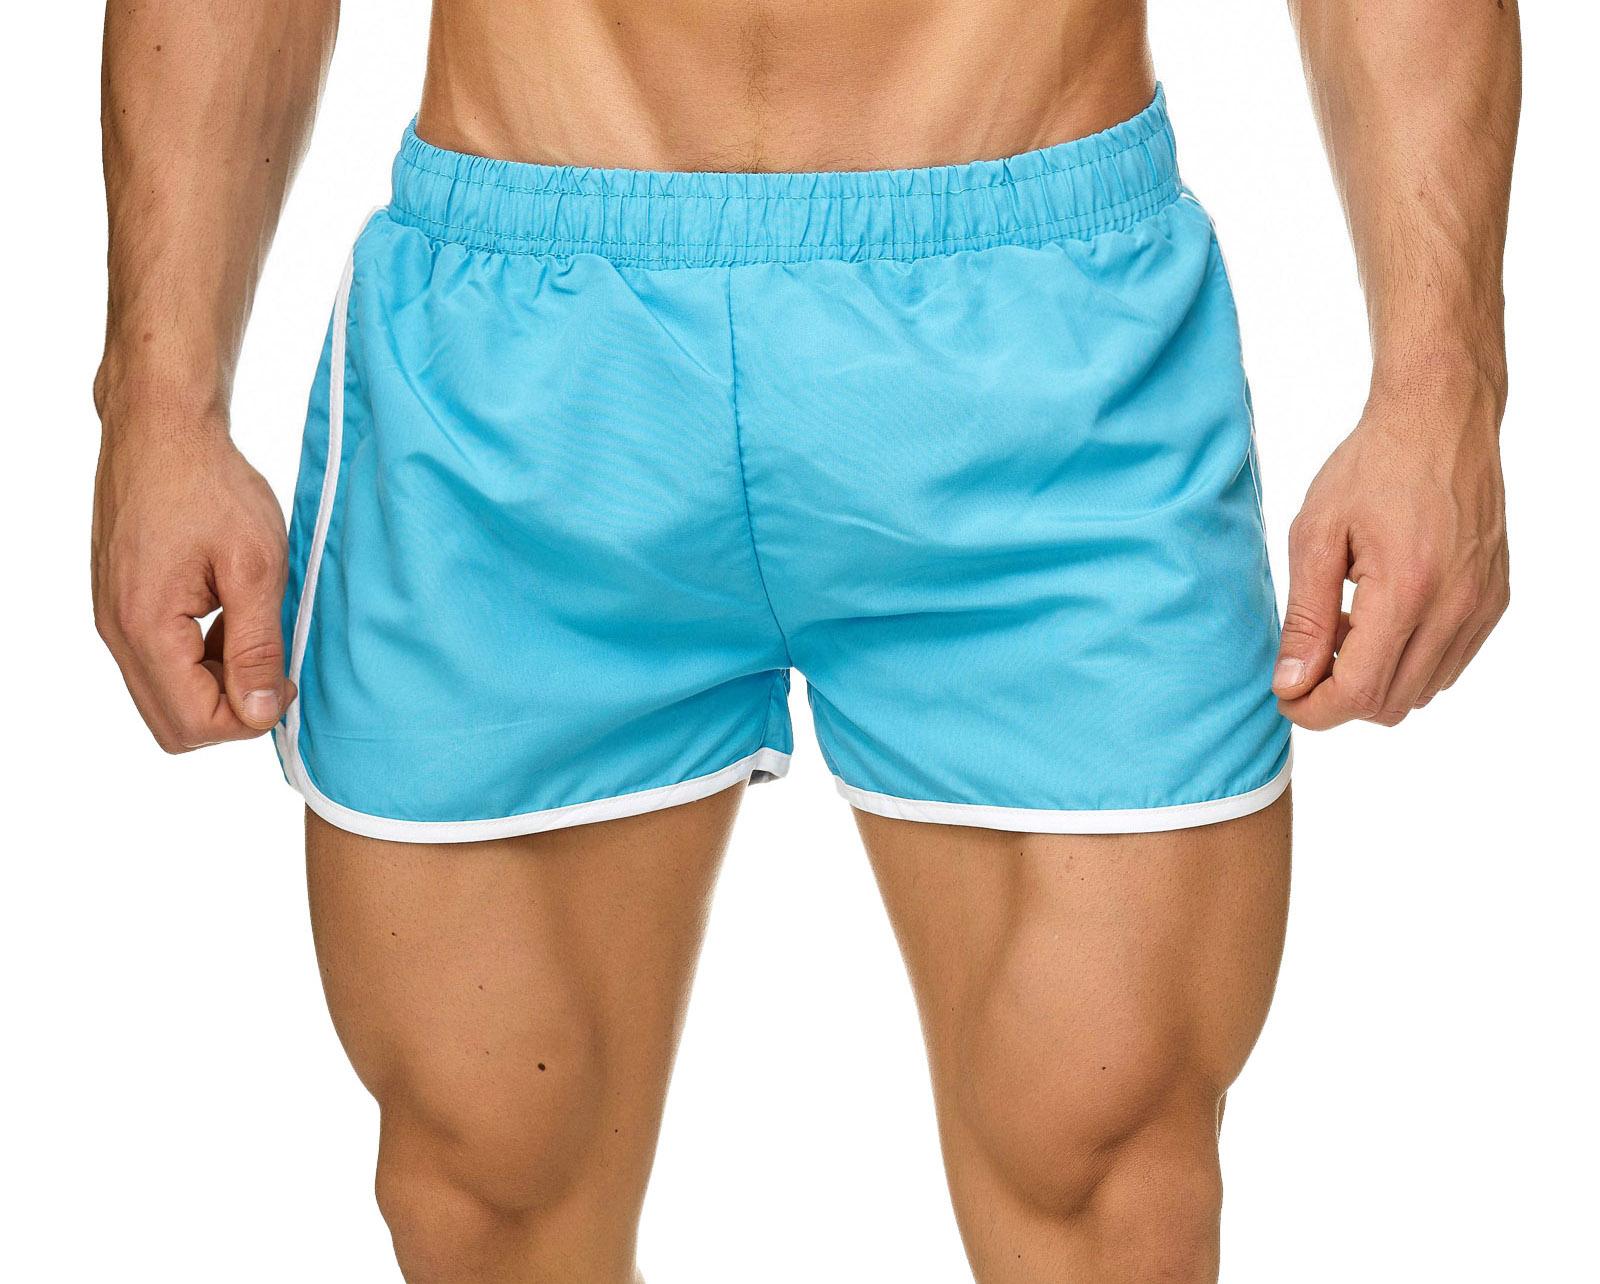 Pantaloncini da bagno marsh arizona shopping